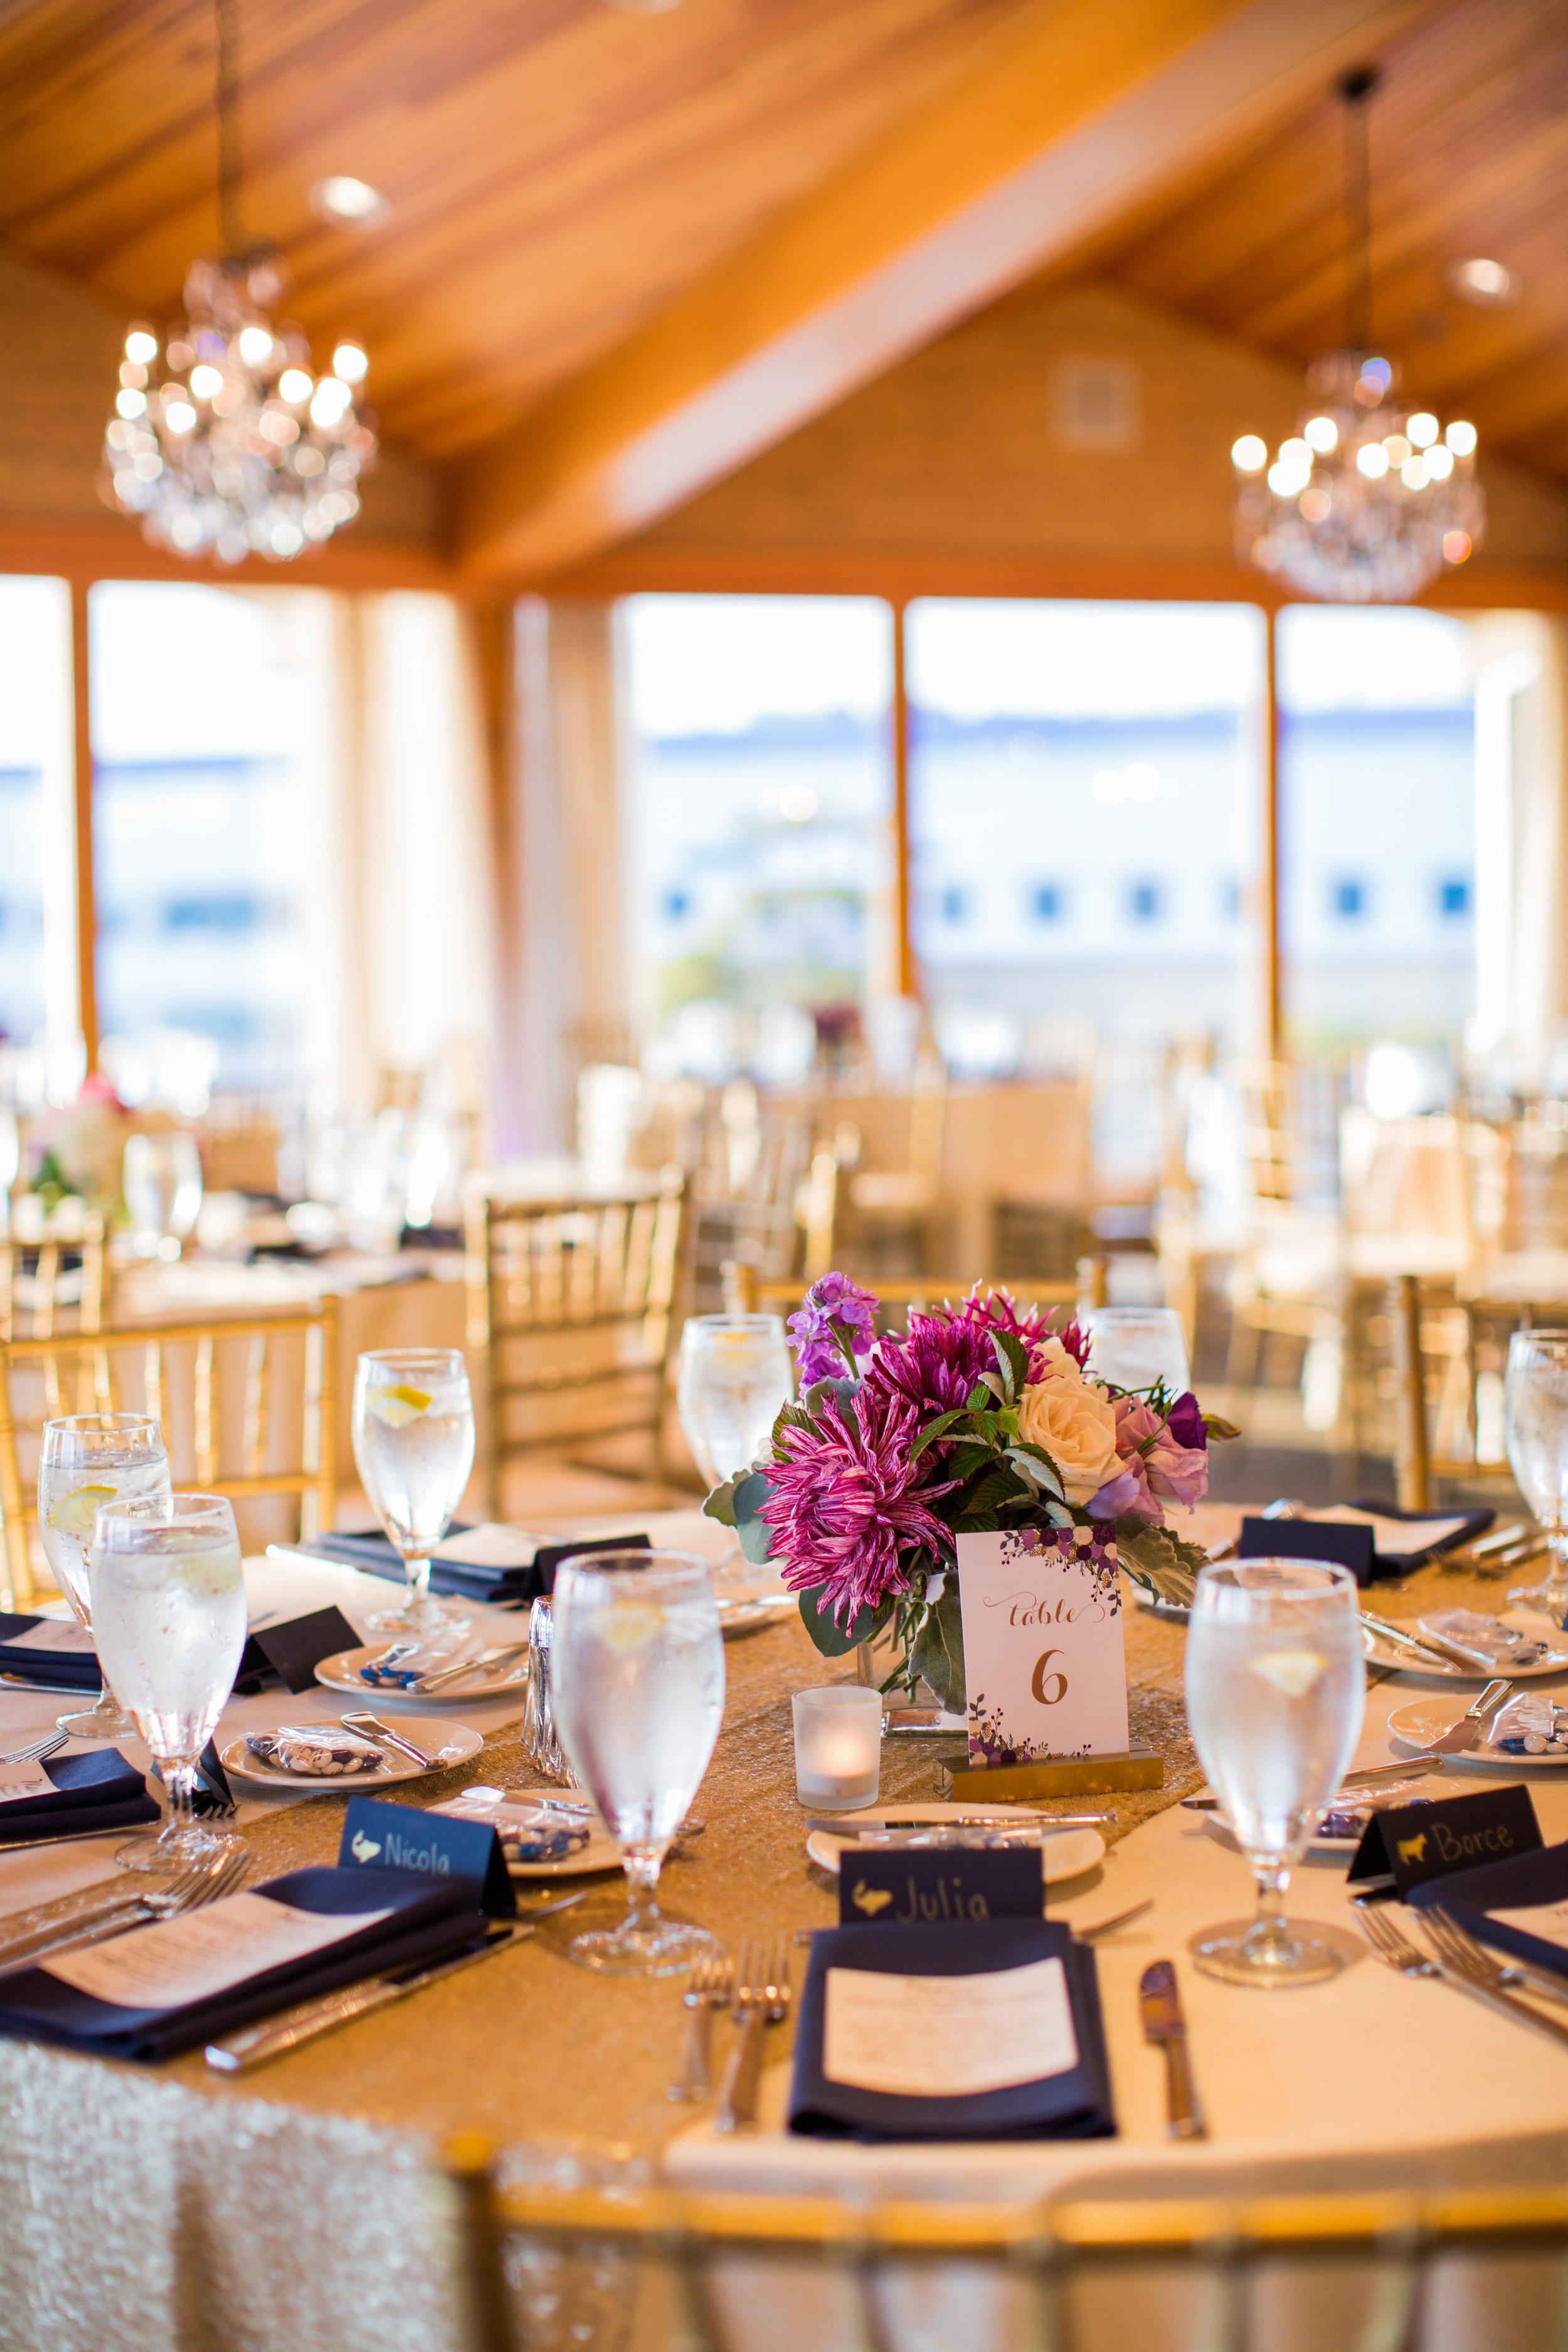 Seattle Wedding Planner, Wedding Wise | Ciccarelli Photography | Edgewater Hotel Wedding | Waterfront wedding | Navy blue and purple wedding